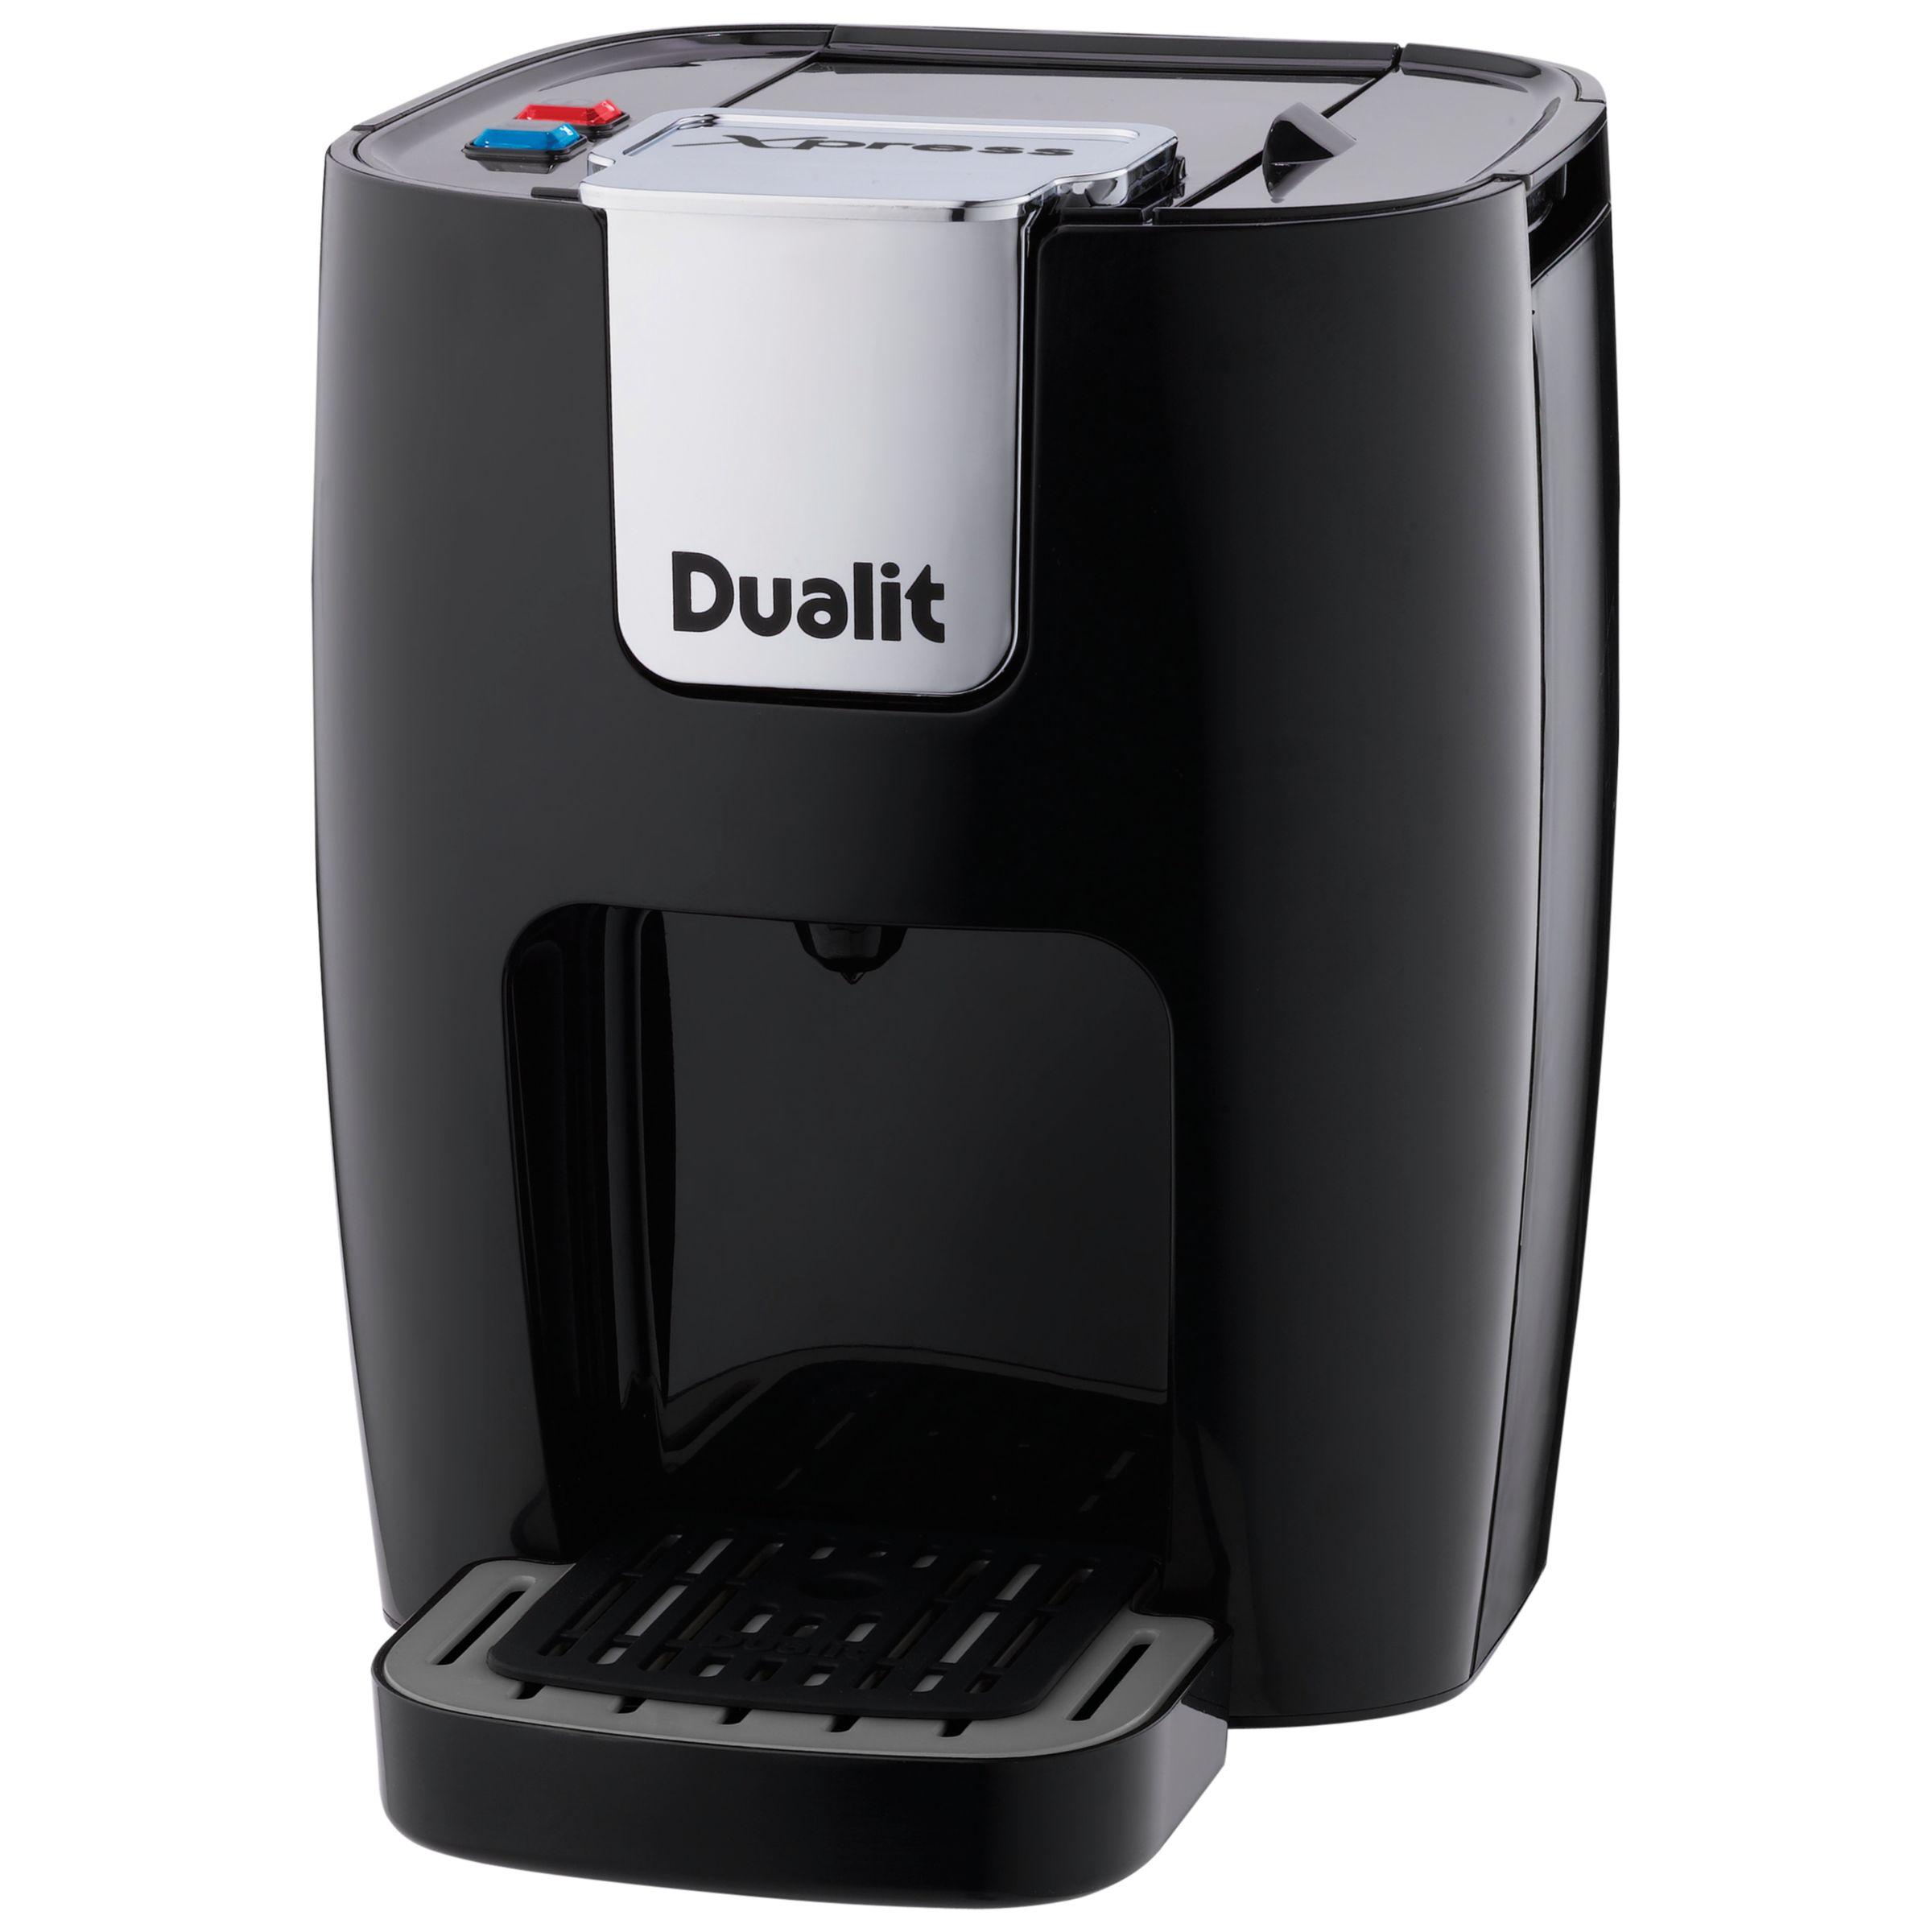 Buy Dualit 84705 Xpress 3 In 1 Coffee Machine, Black John Lewis